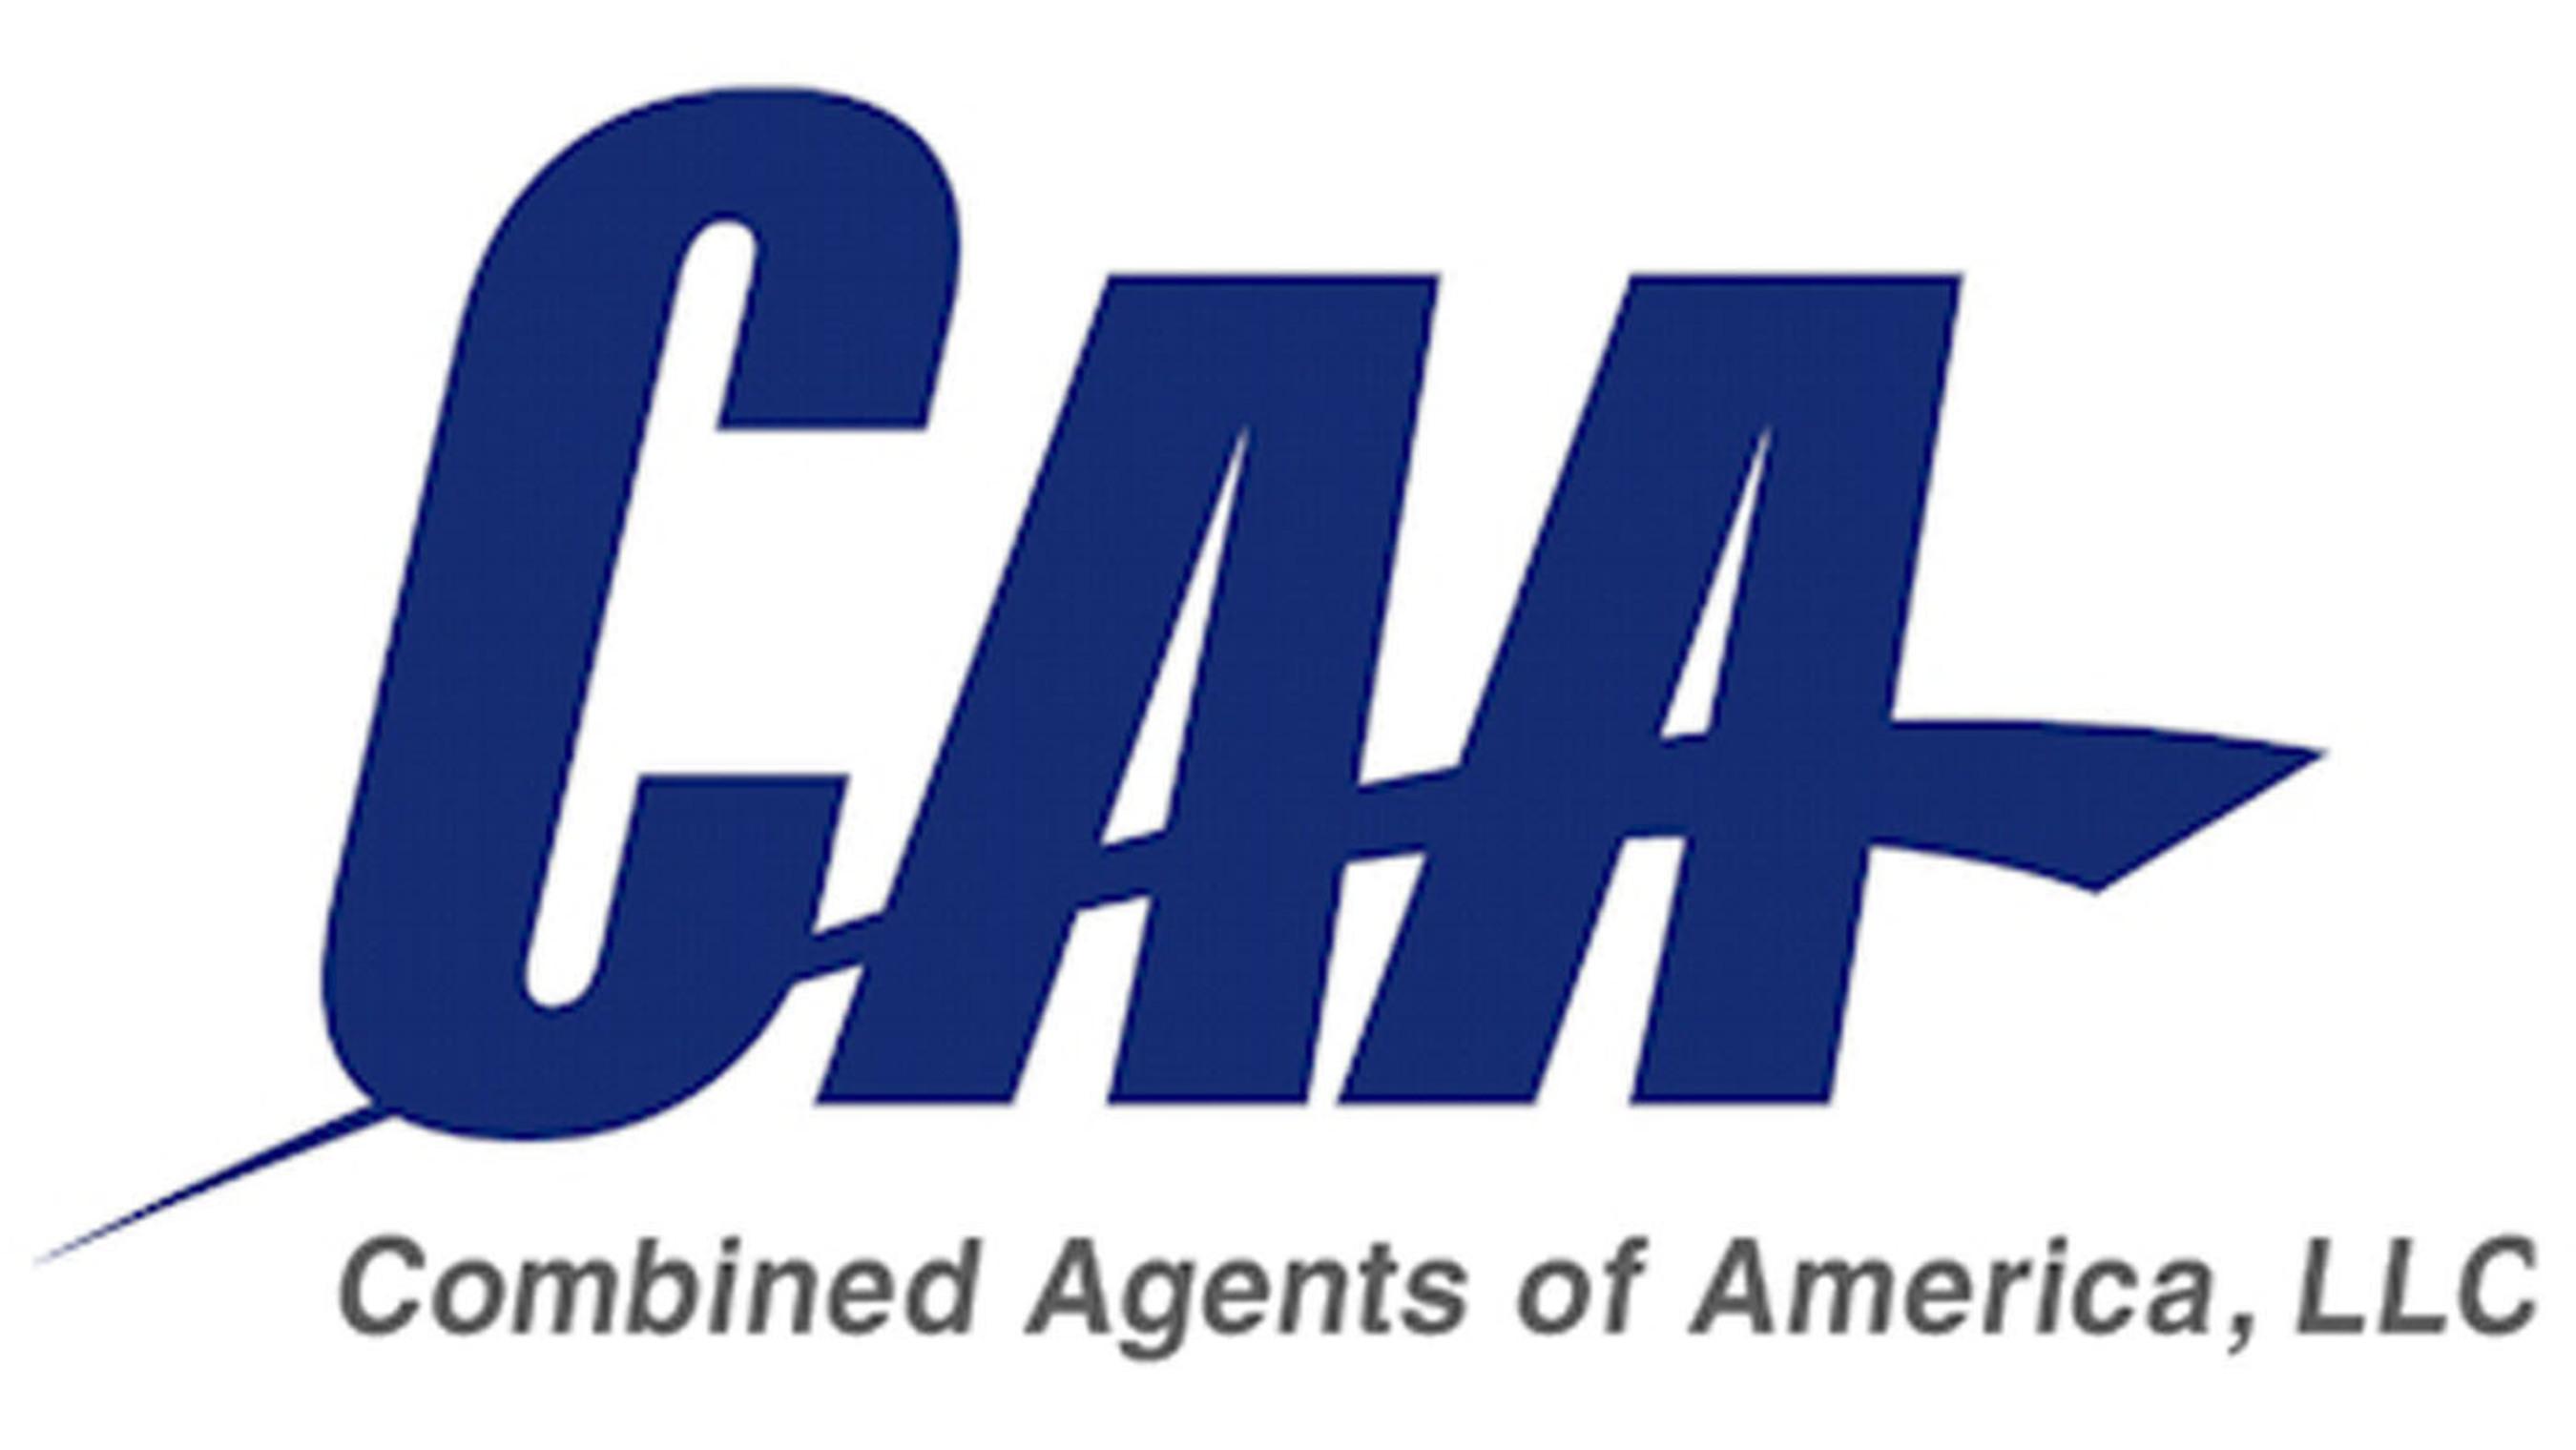 Combined Agents of America, LLC Logo.